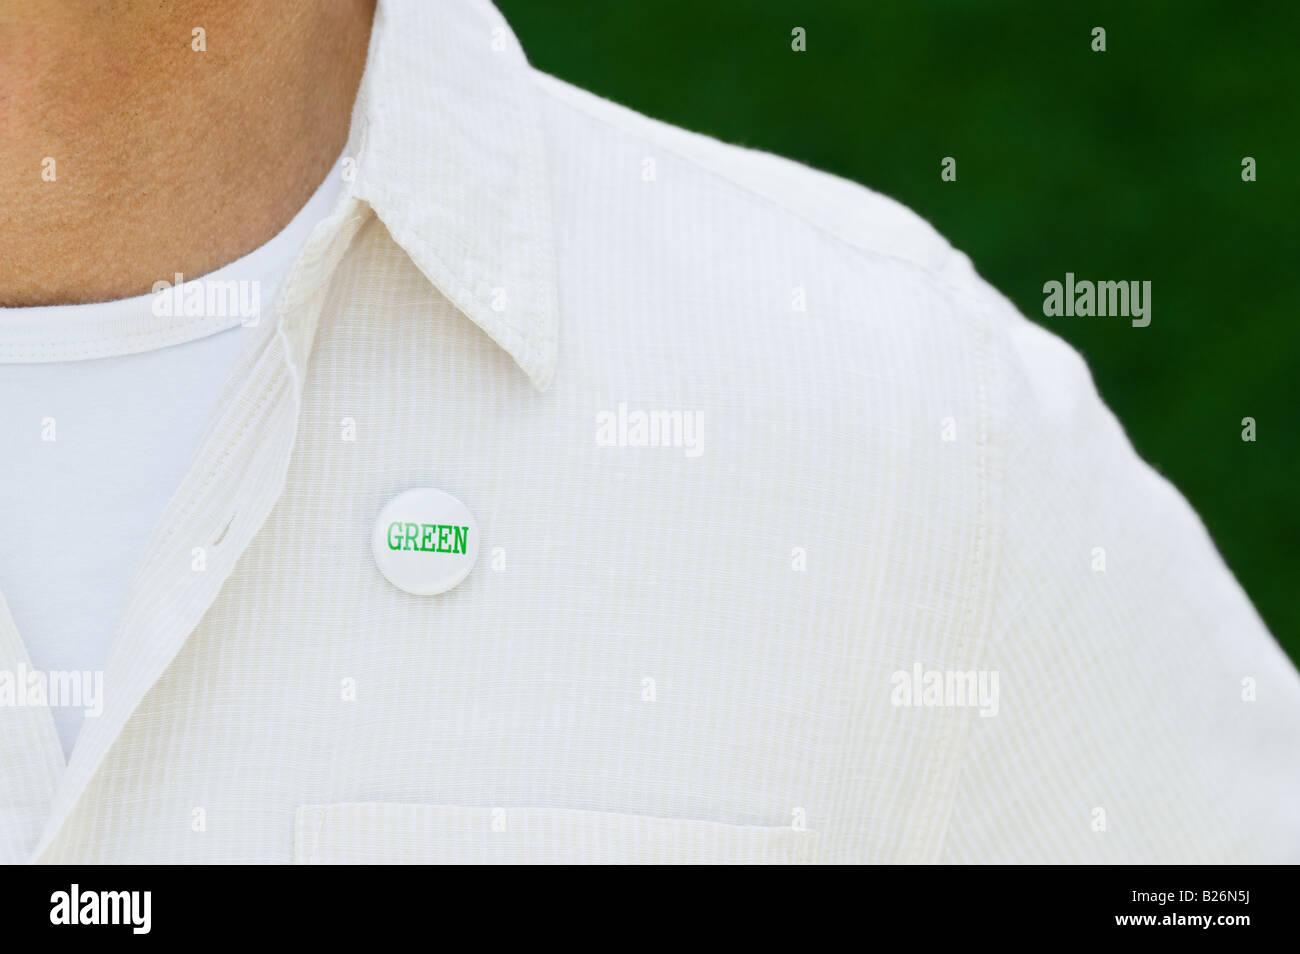 Öko-Taste auf Mannes Hemd Stockbild